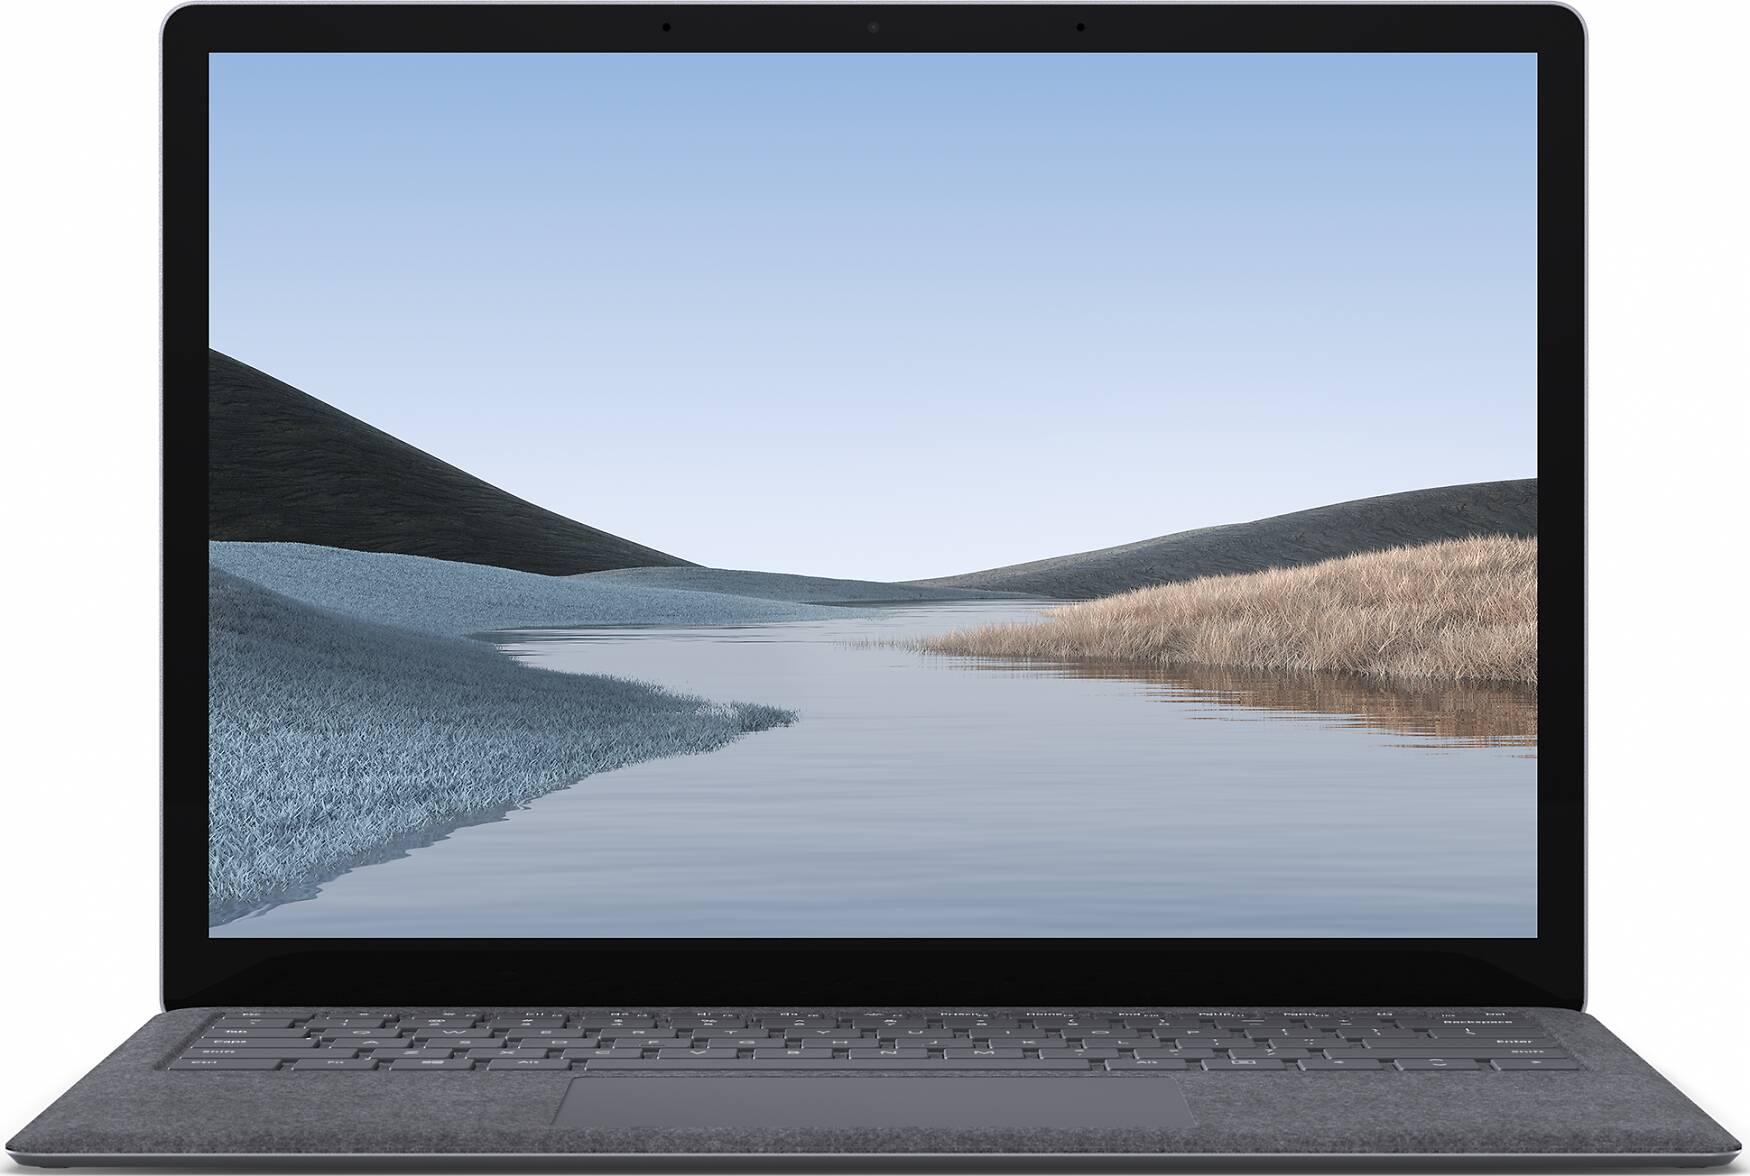 Microsoft Surface Laptop 3 13,5 Zoll, Core i5, 8GB RAM, 256GB SSD, Platin